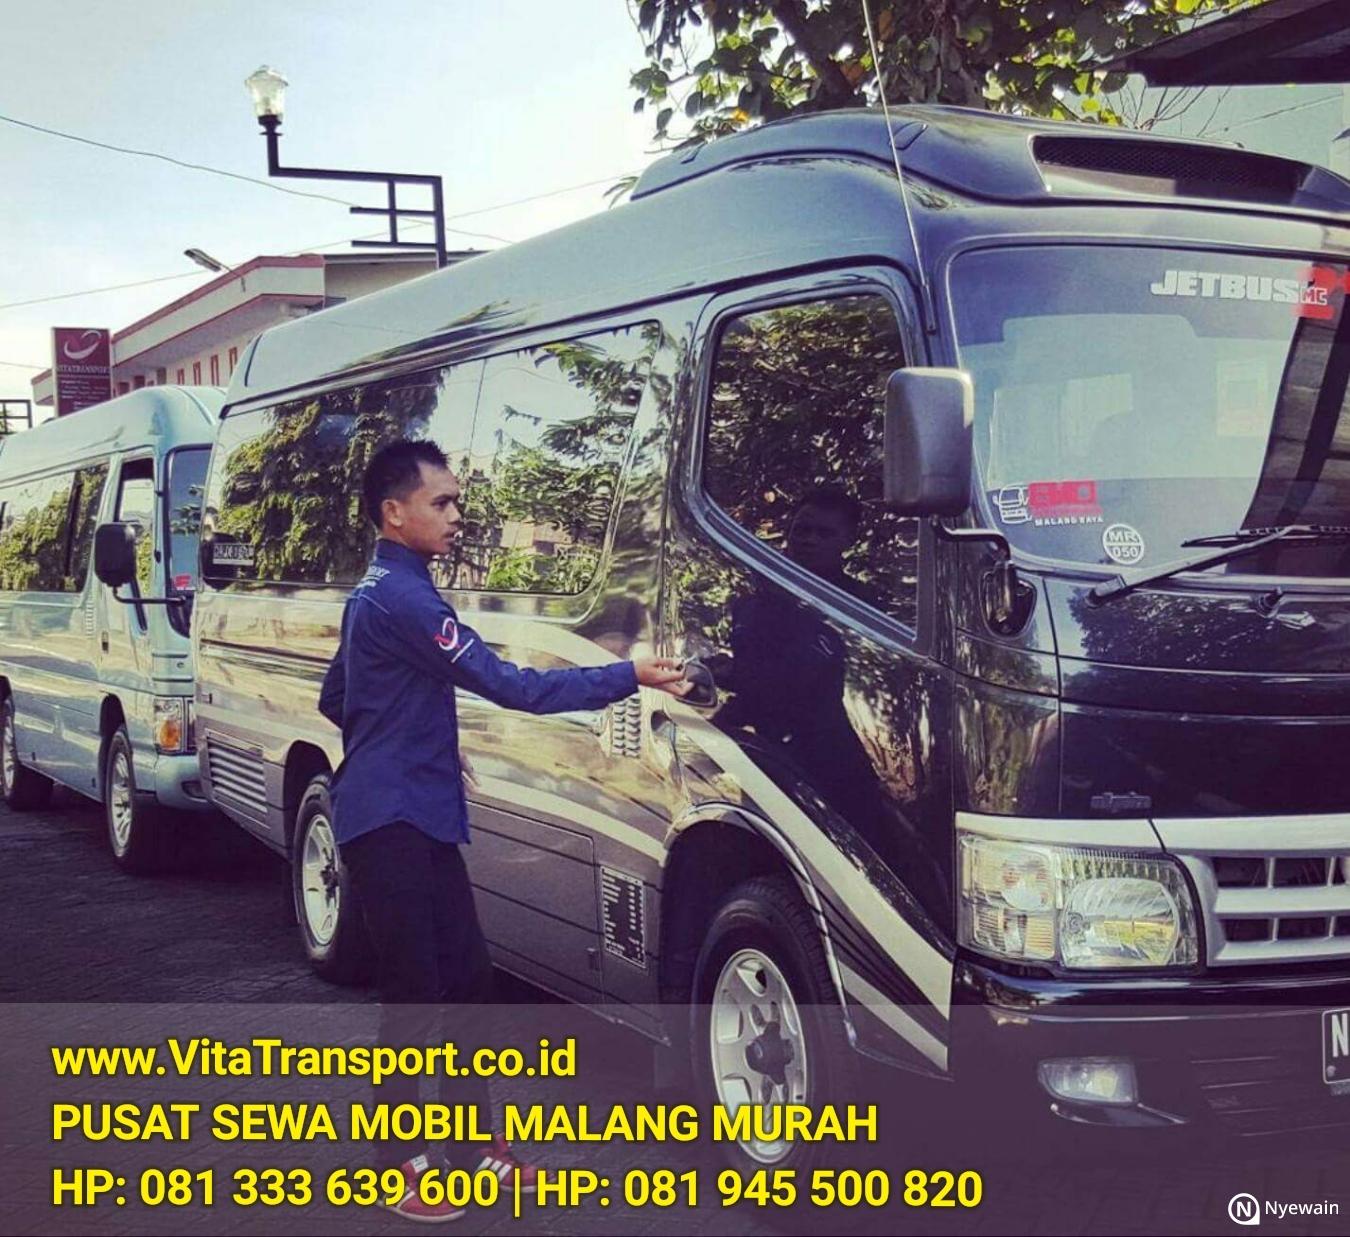 Persewaan Mobil Elf Malang, Rental Mobil Elf Malang, Sewa ...